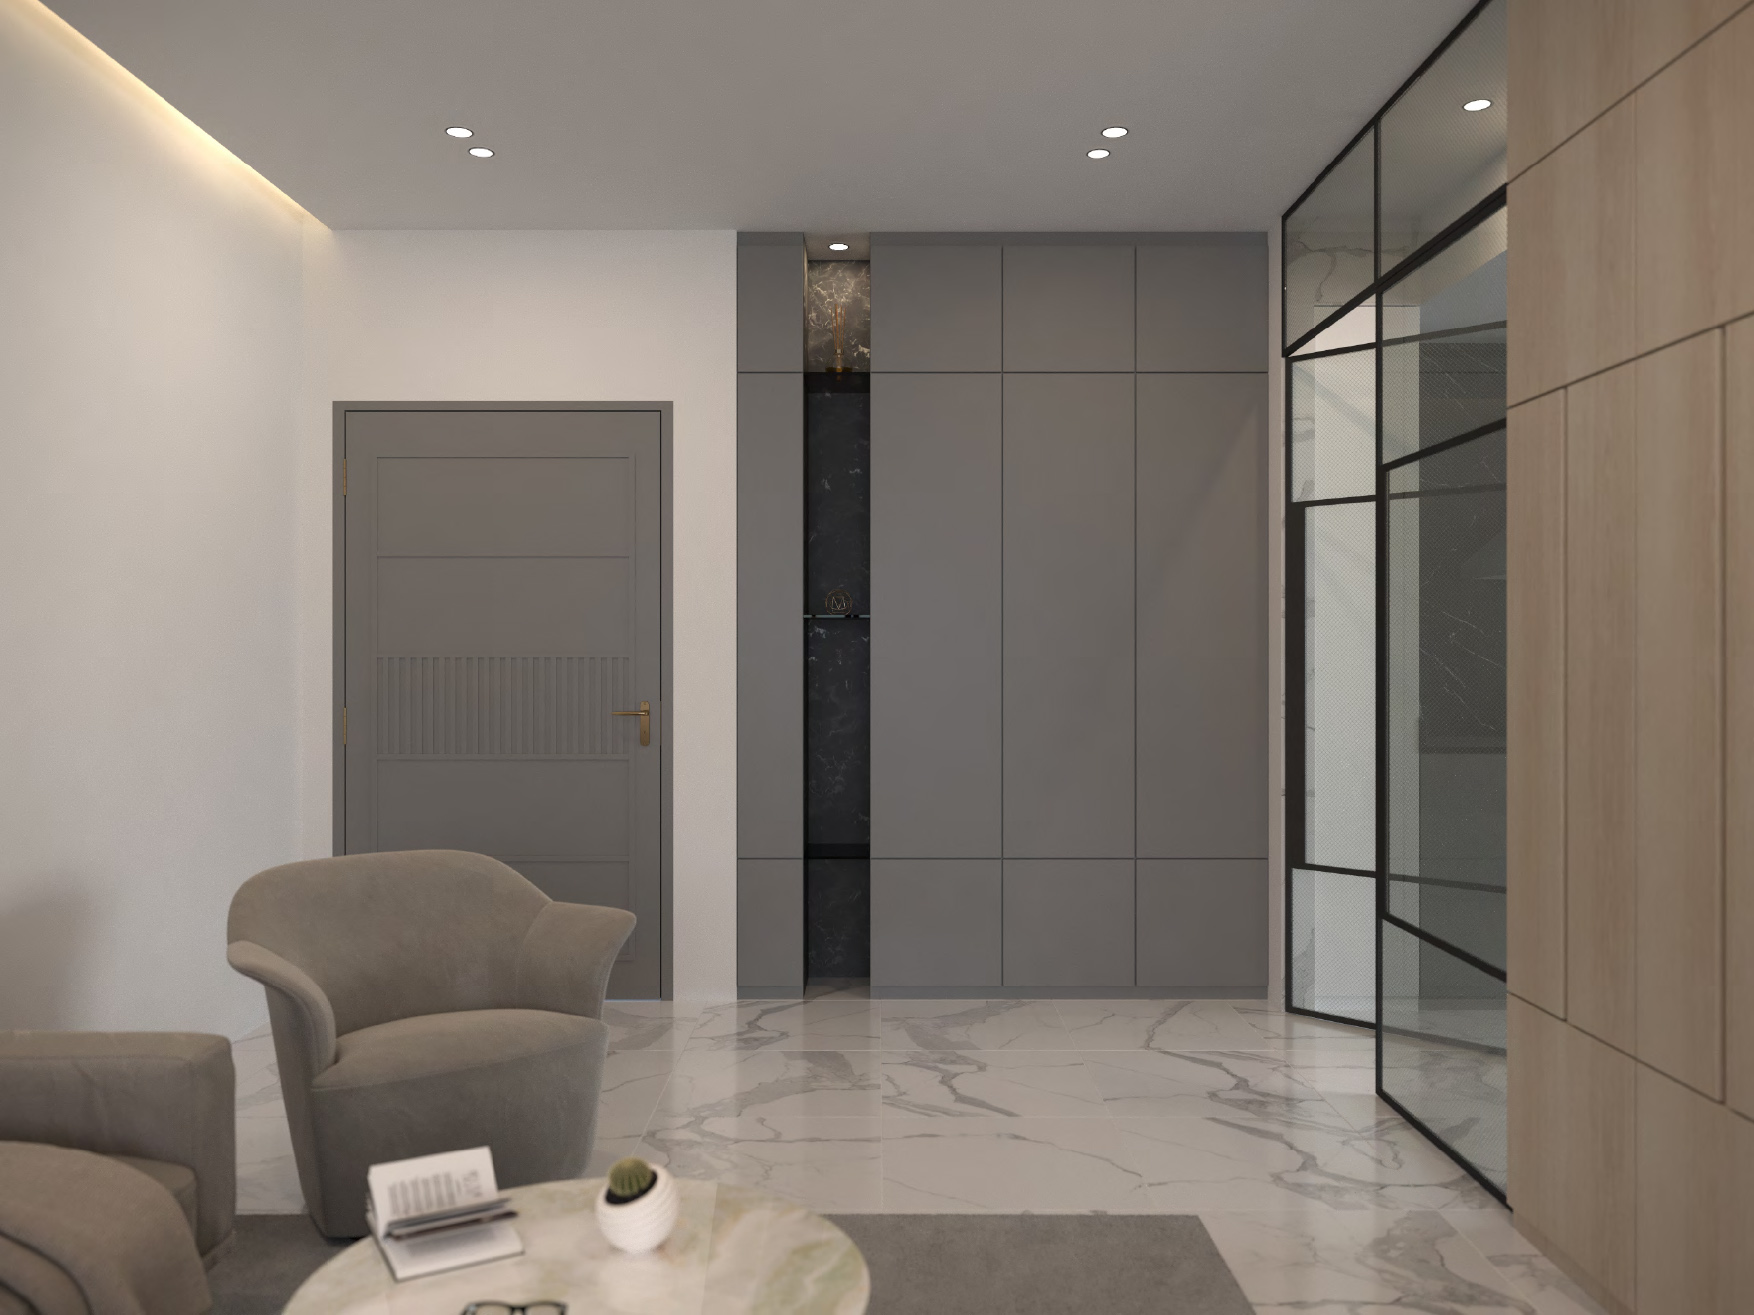 001 - Foyer